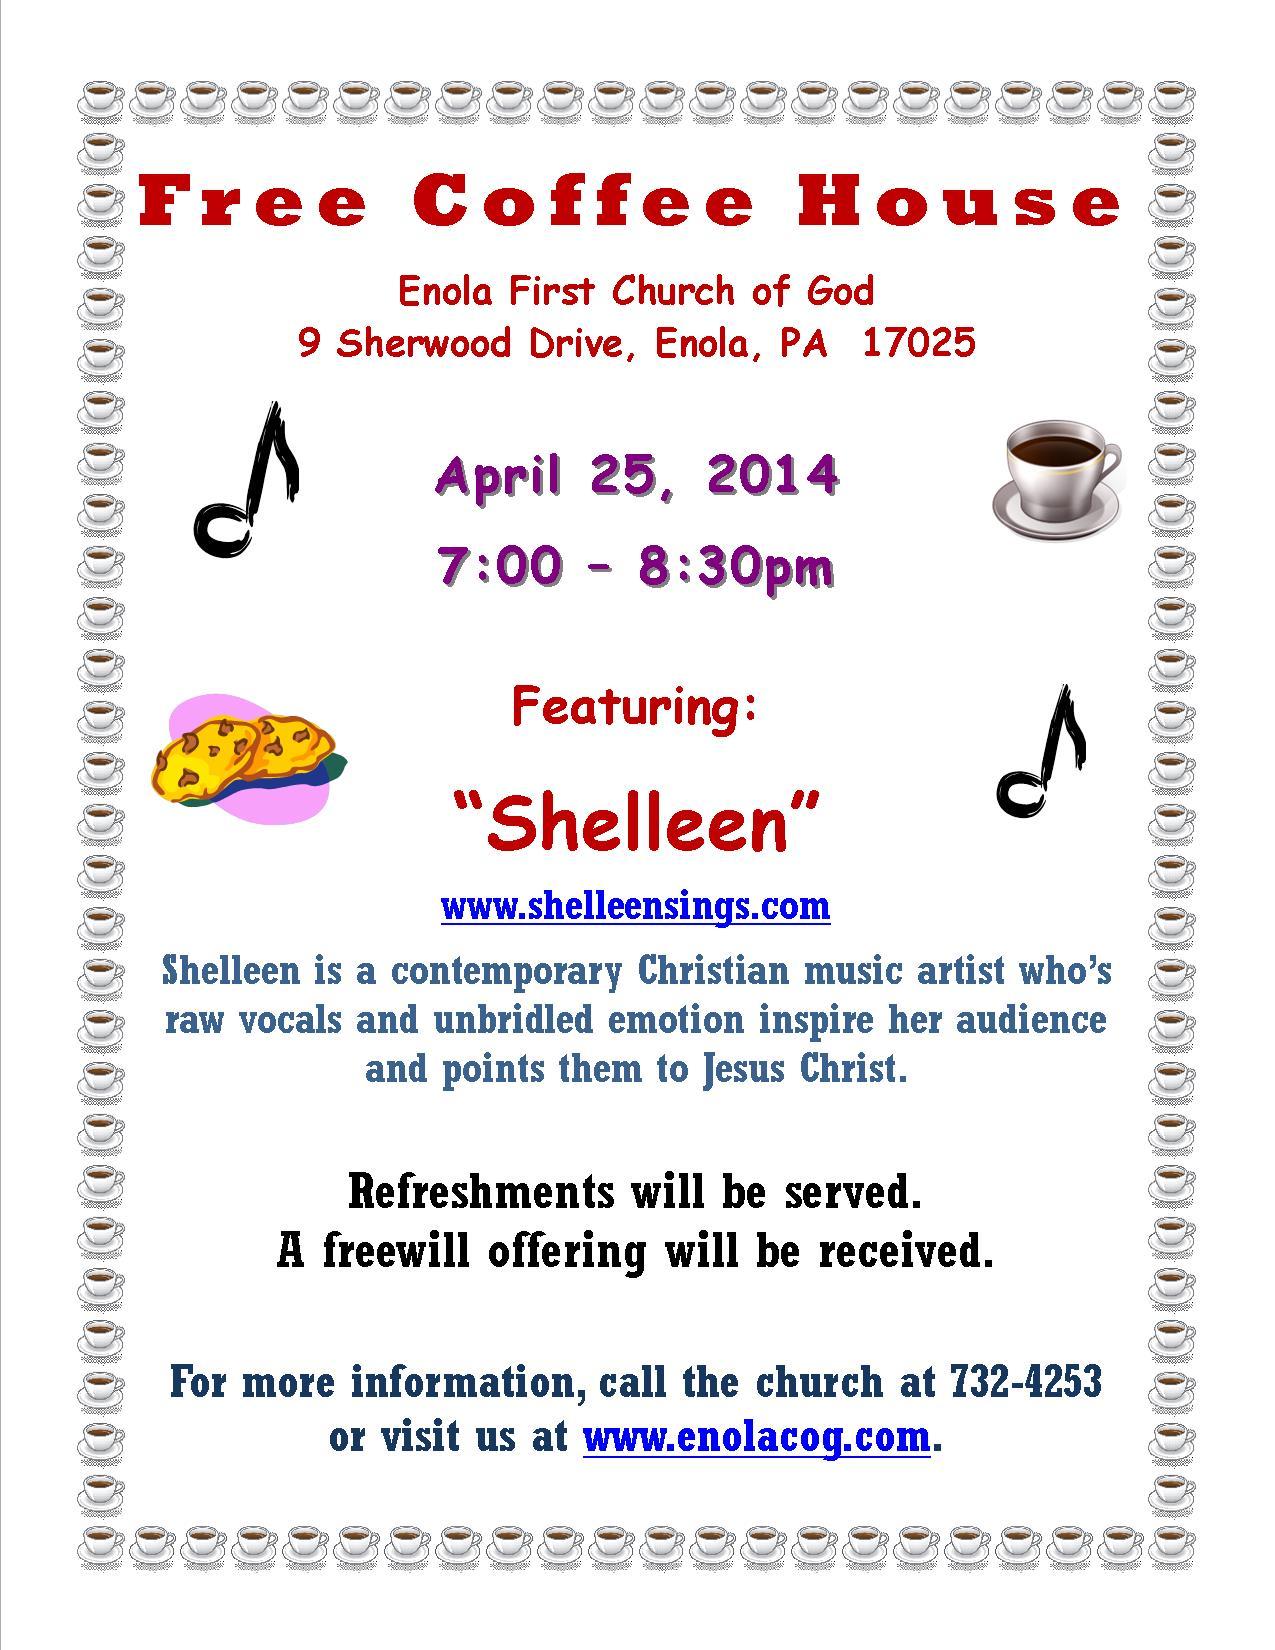 Coffee House Ad - Shelleen